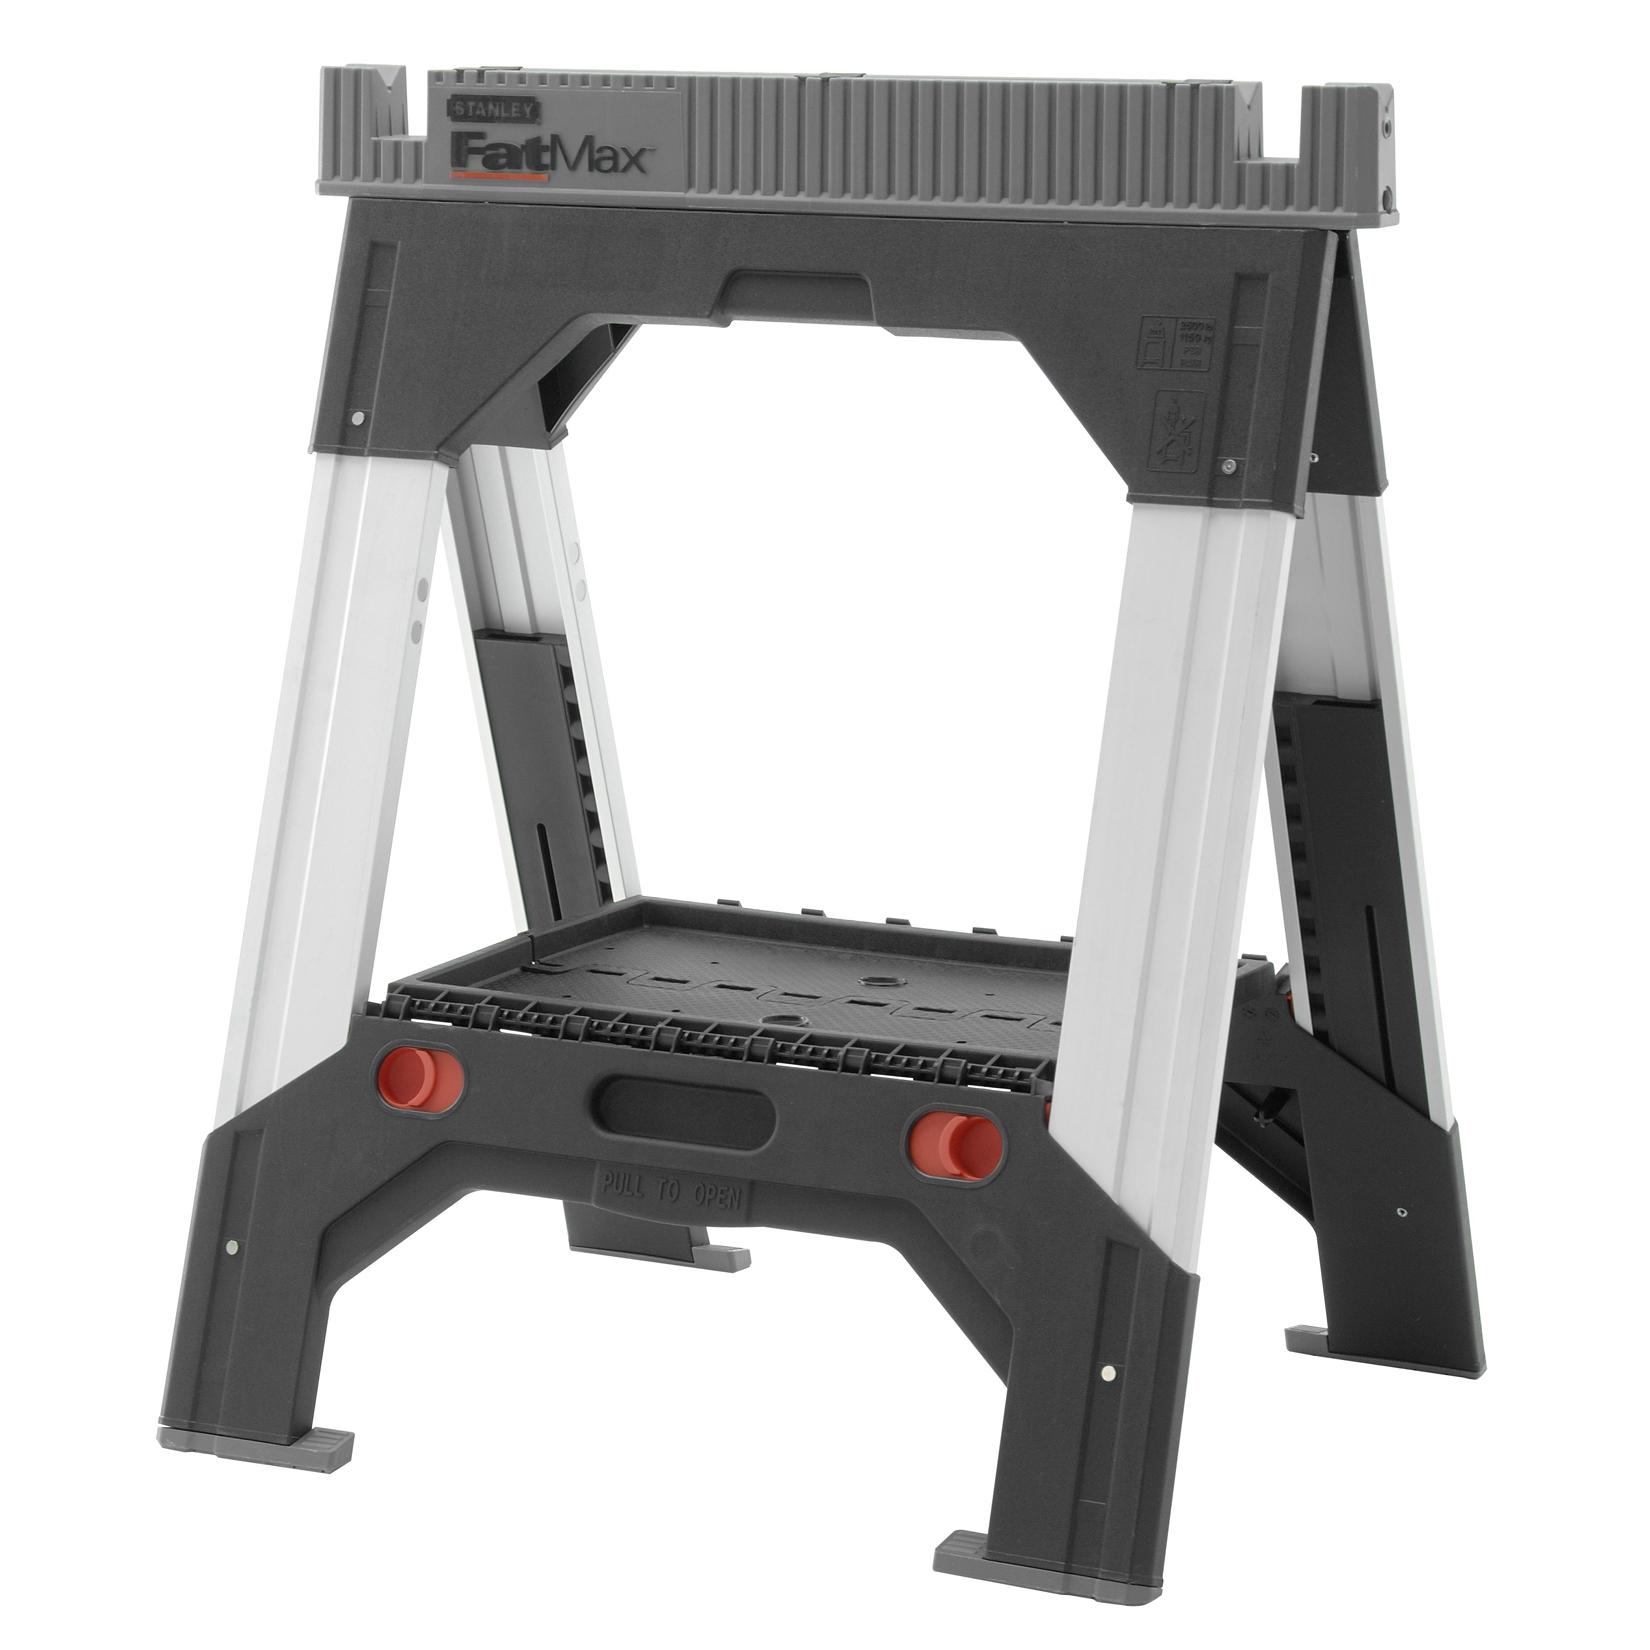 Stanley Fatmax Xtreme 011031S Steel Telescopic Legs FatMax Xtreme™ Sawhorse